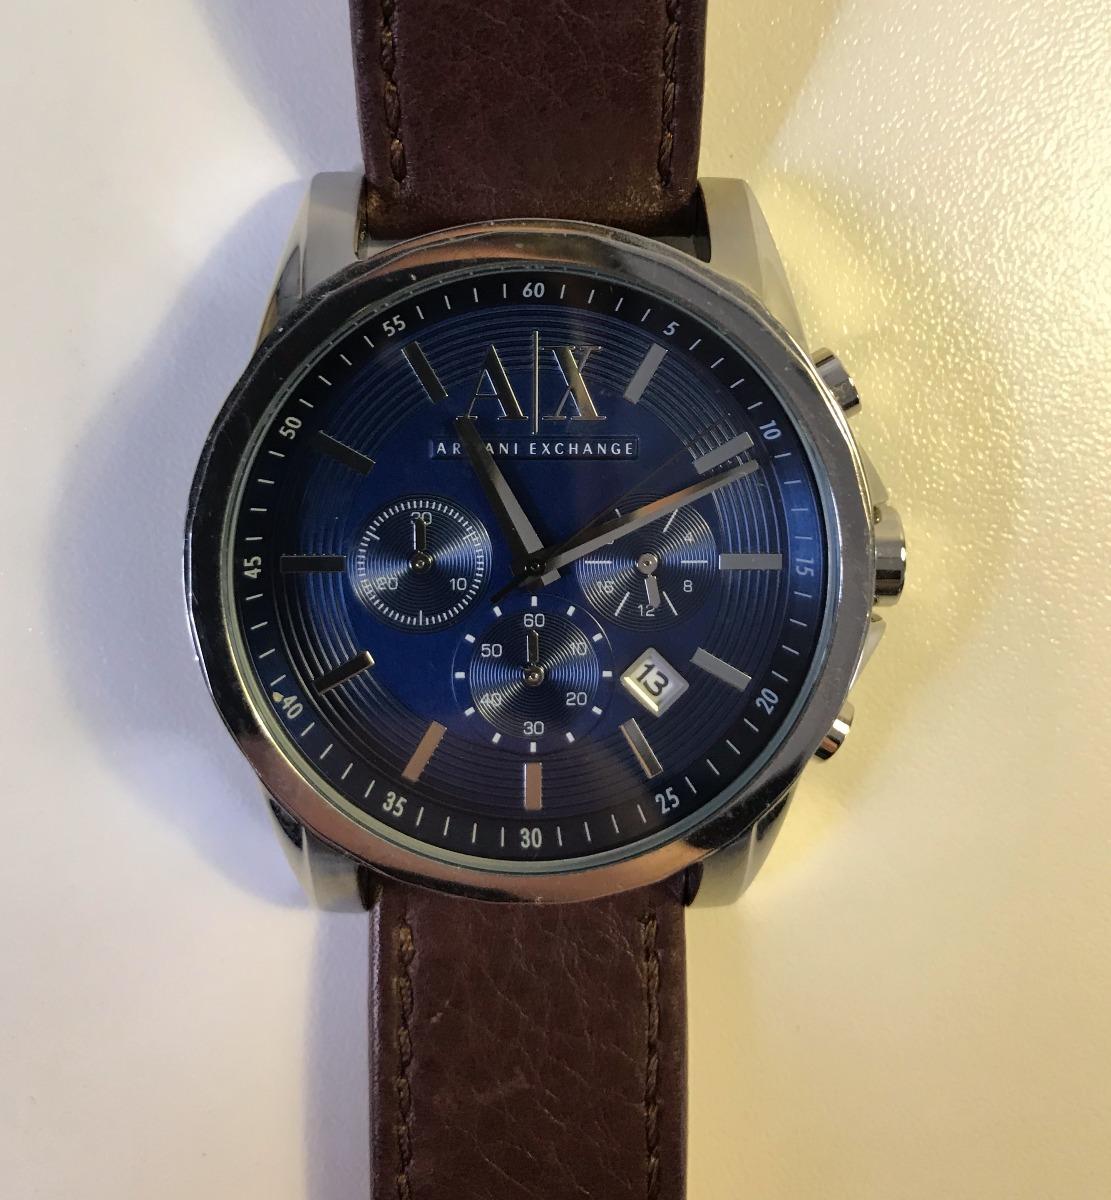 509df6caa1d Relógio Armani Exchange - Original - Seminovo - R  299